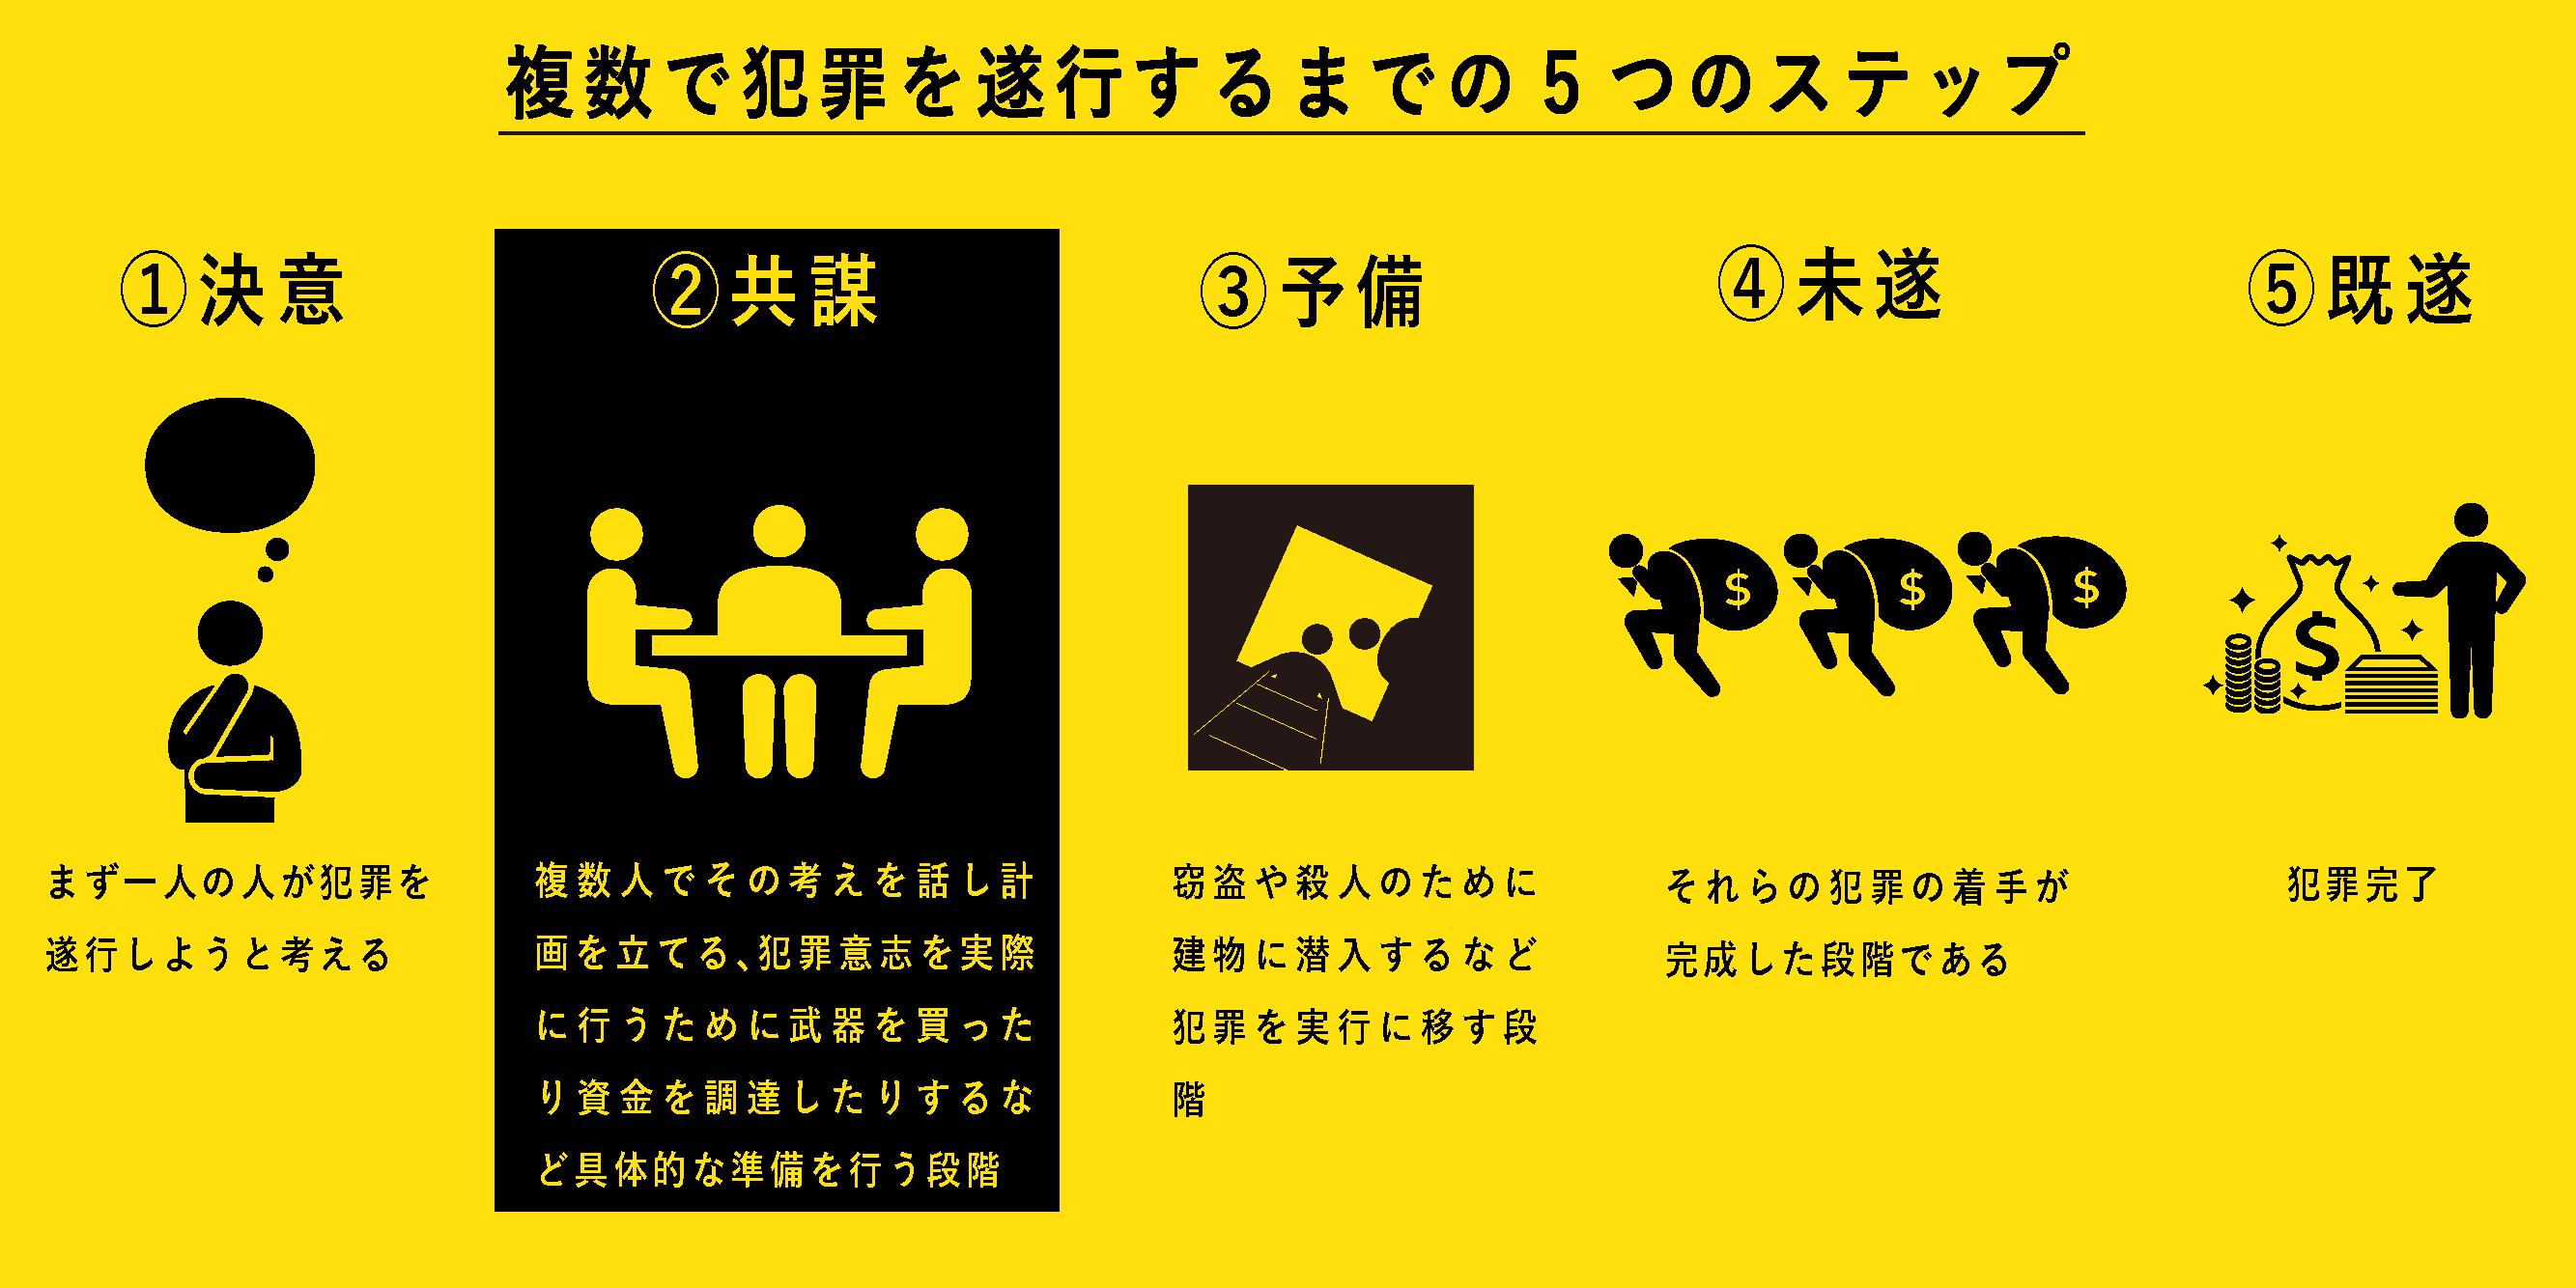 P共謀罪-03